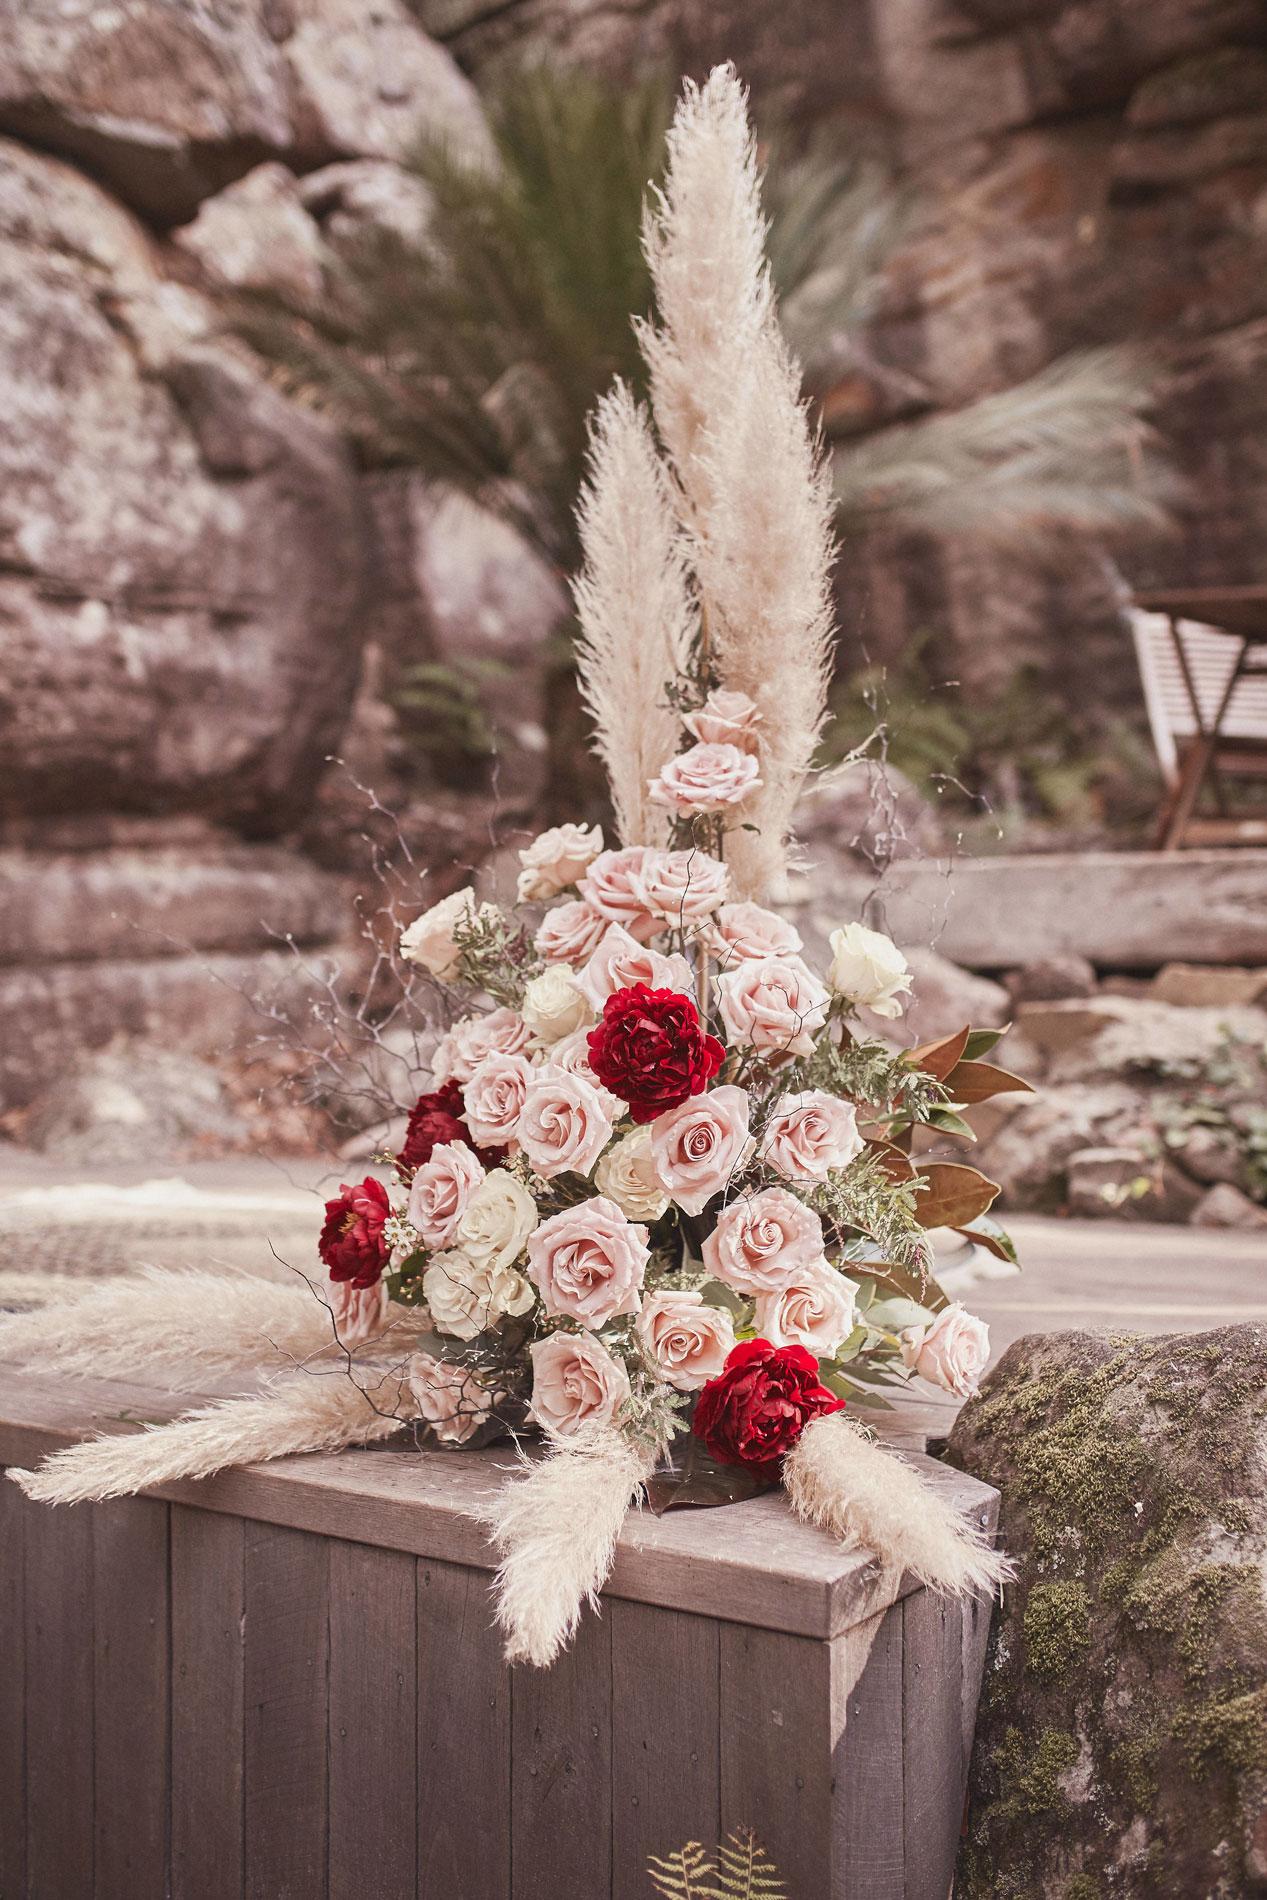 wedding_flowers_brooke_pierre3.jpg